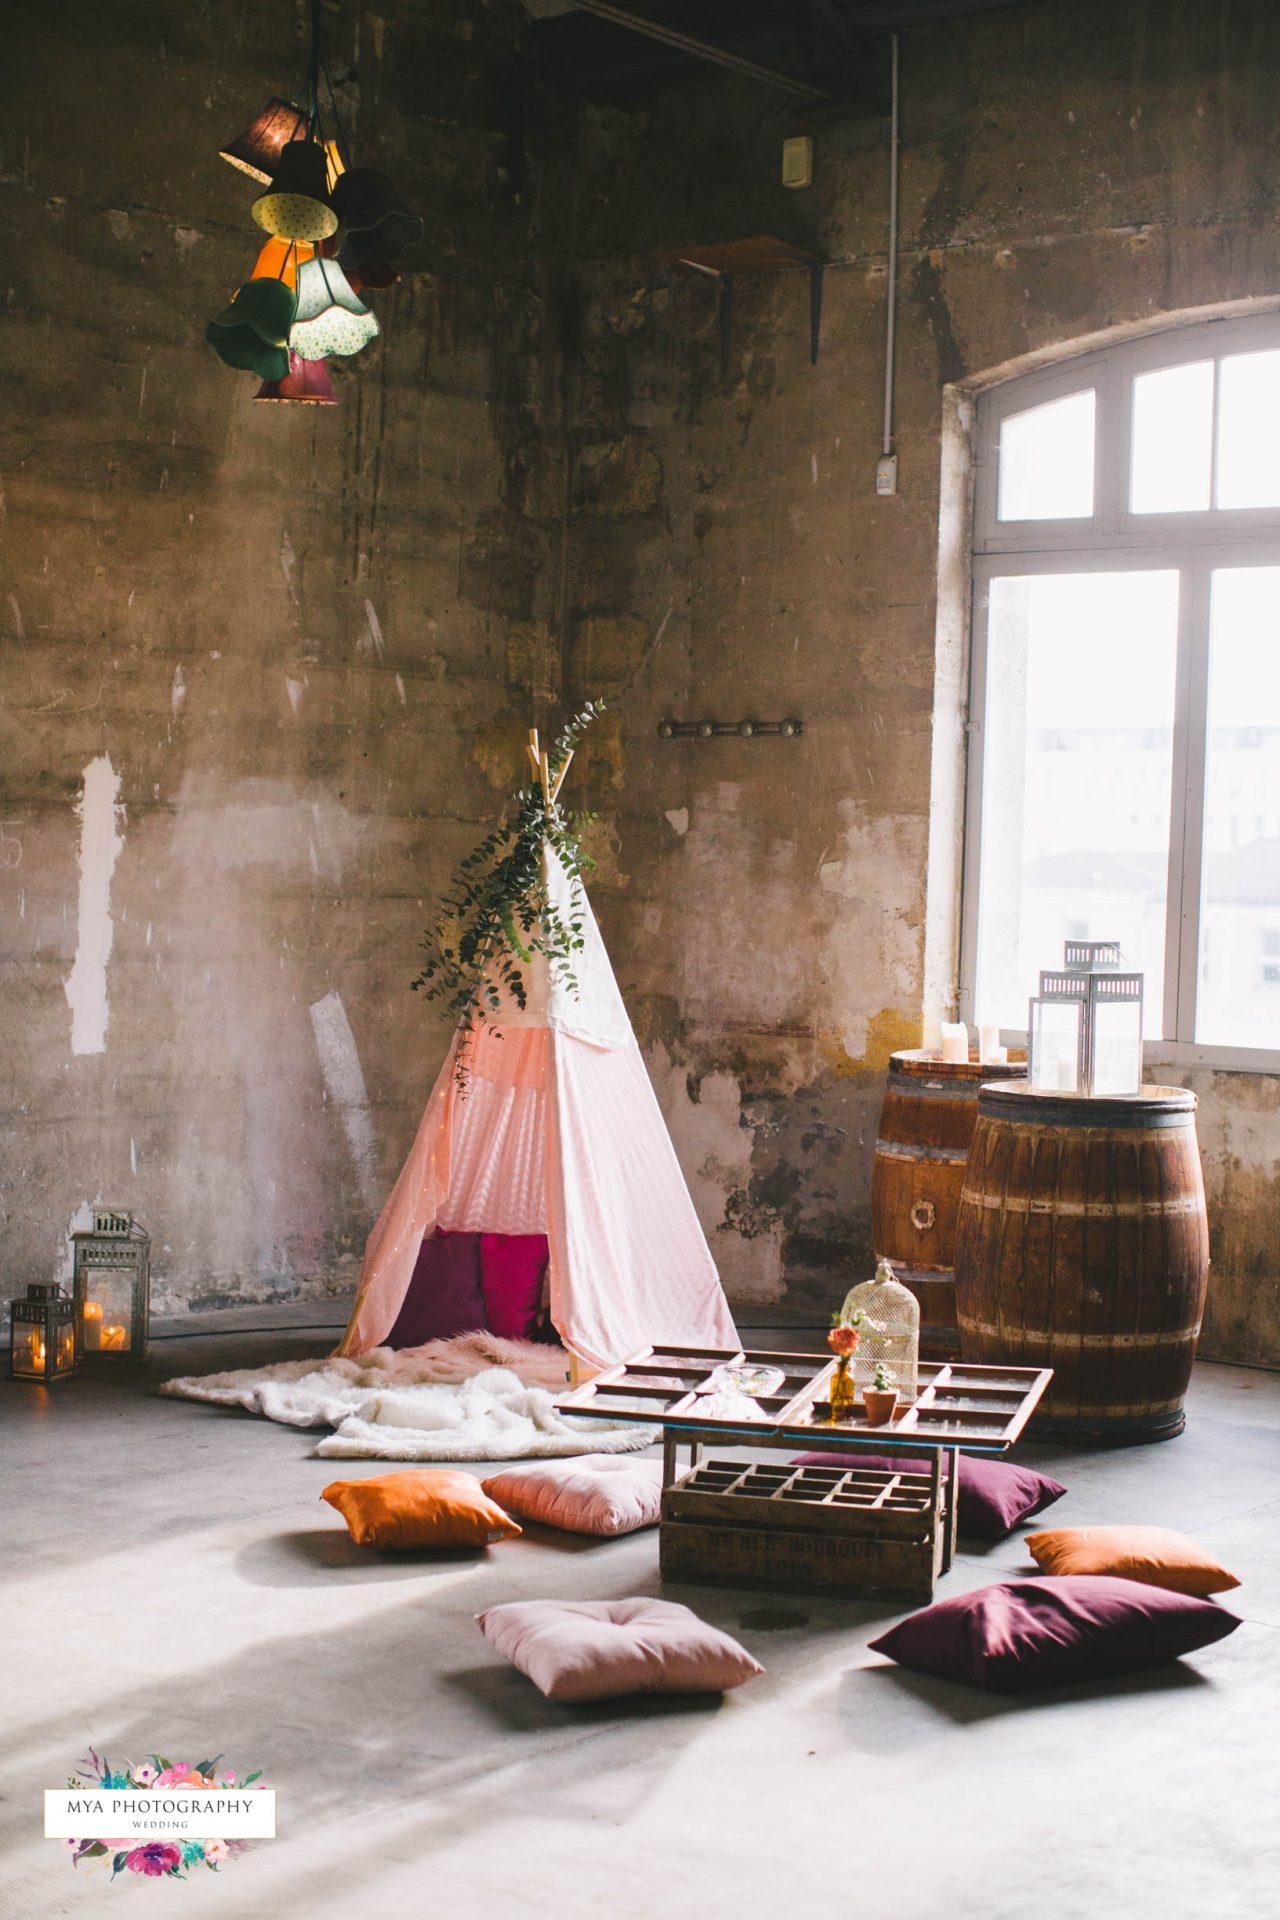 salon du mariage tendm 2016 photographe mariage bordeaux mya photography. Black Bedroom Furniture Sets. Home Design Ideas